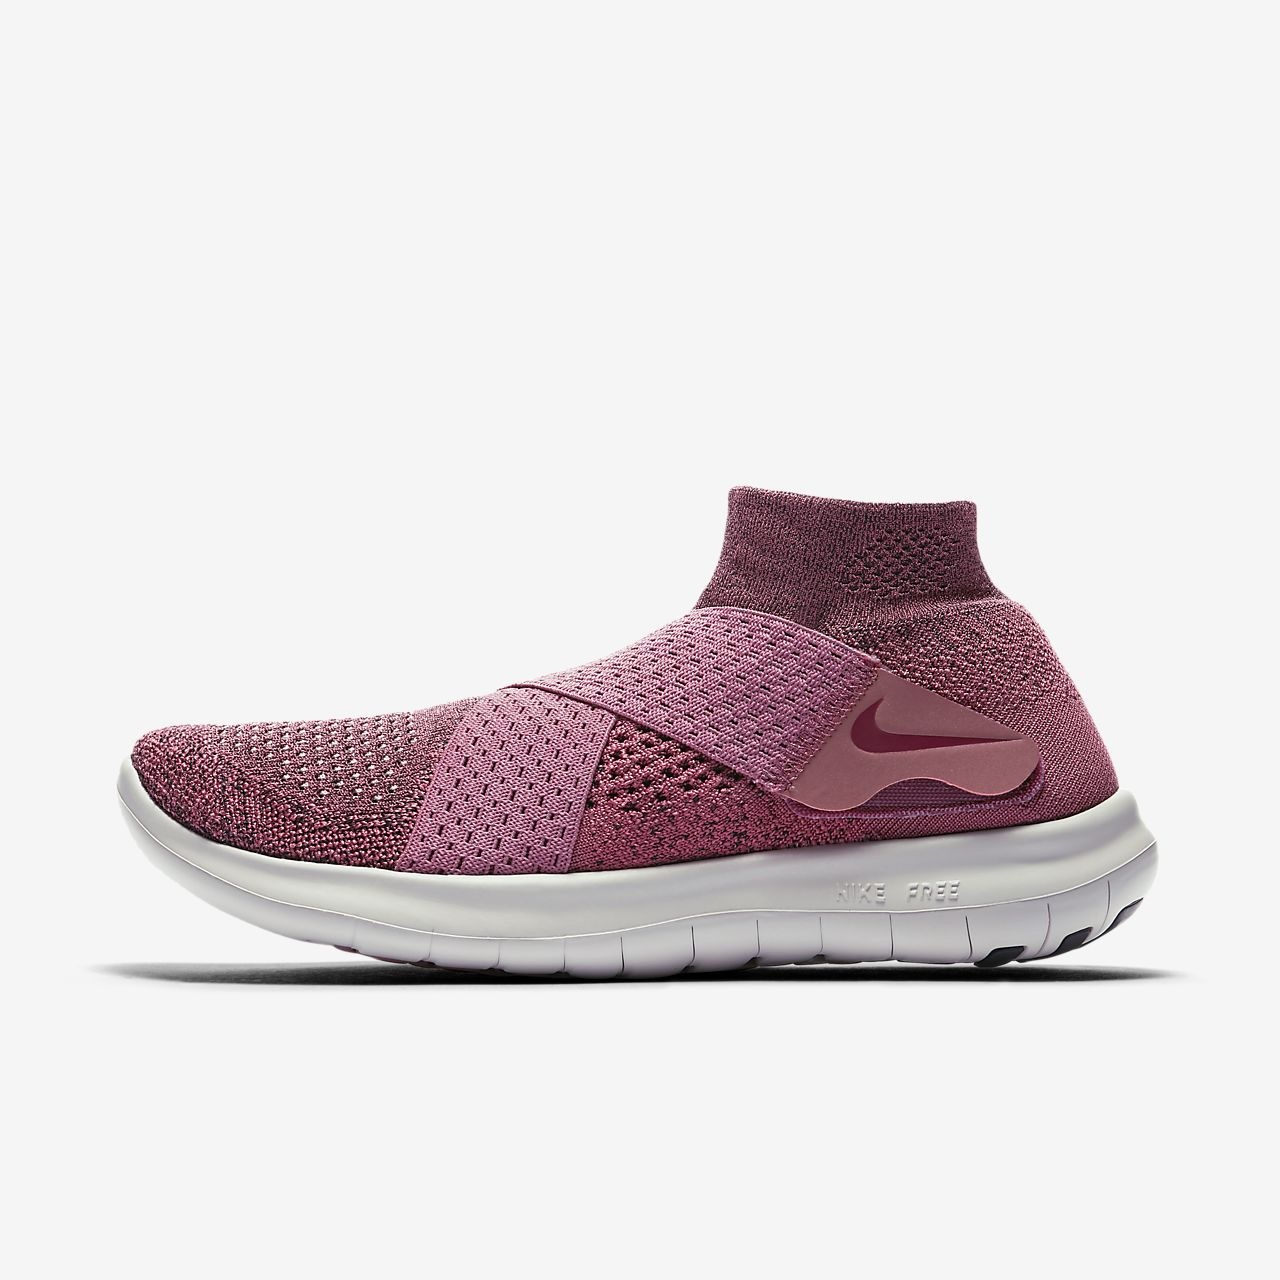 free shipping 6d4a2 f123b ... Calzado de running para mujer Nike Free RN Motion Flyknit 2017